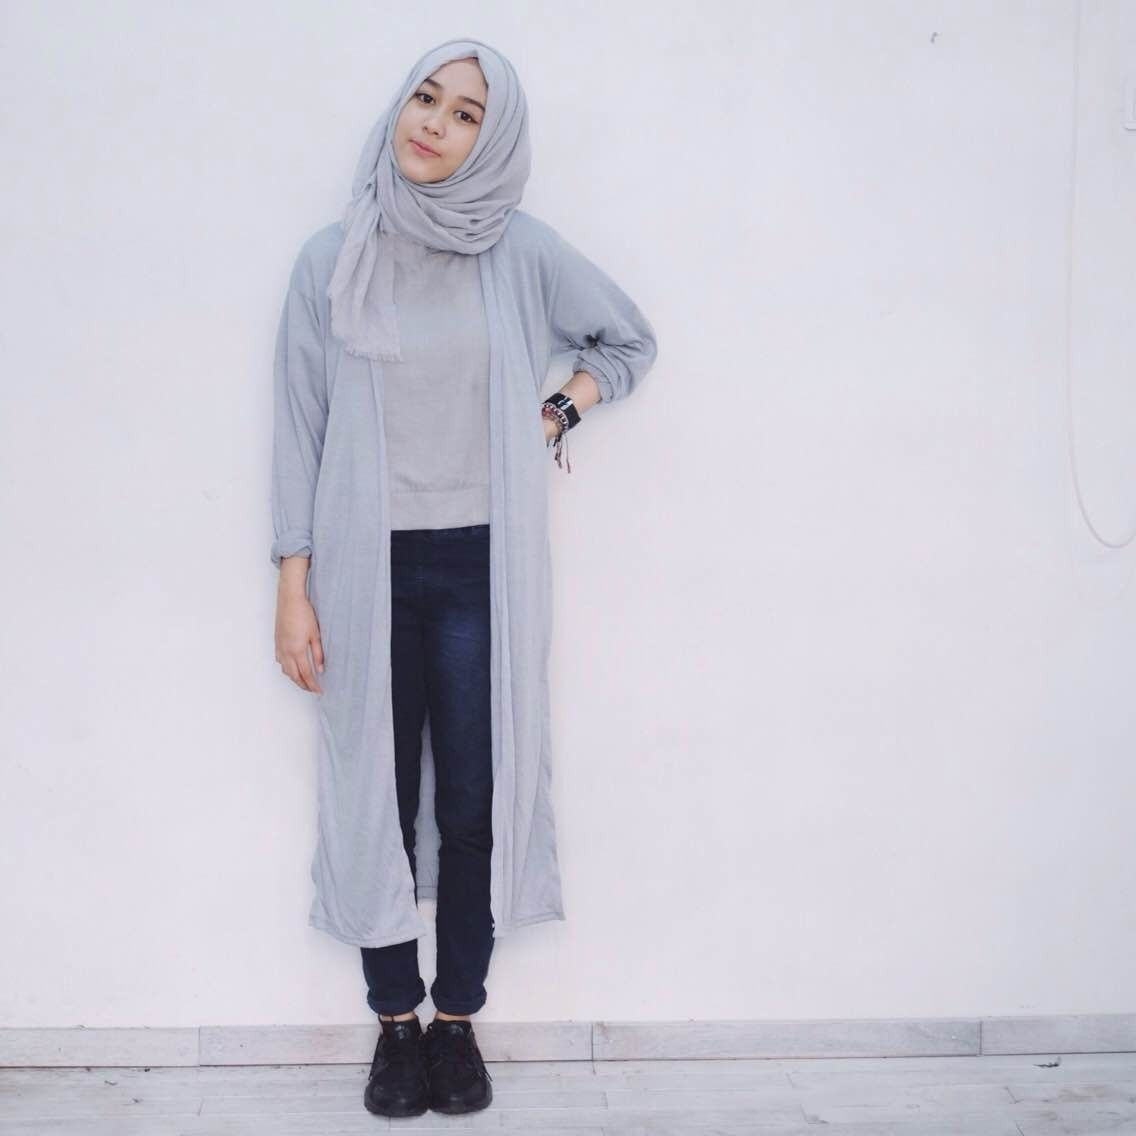 7 contekan gaya baju muslim casual keren tapi tetap sopan